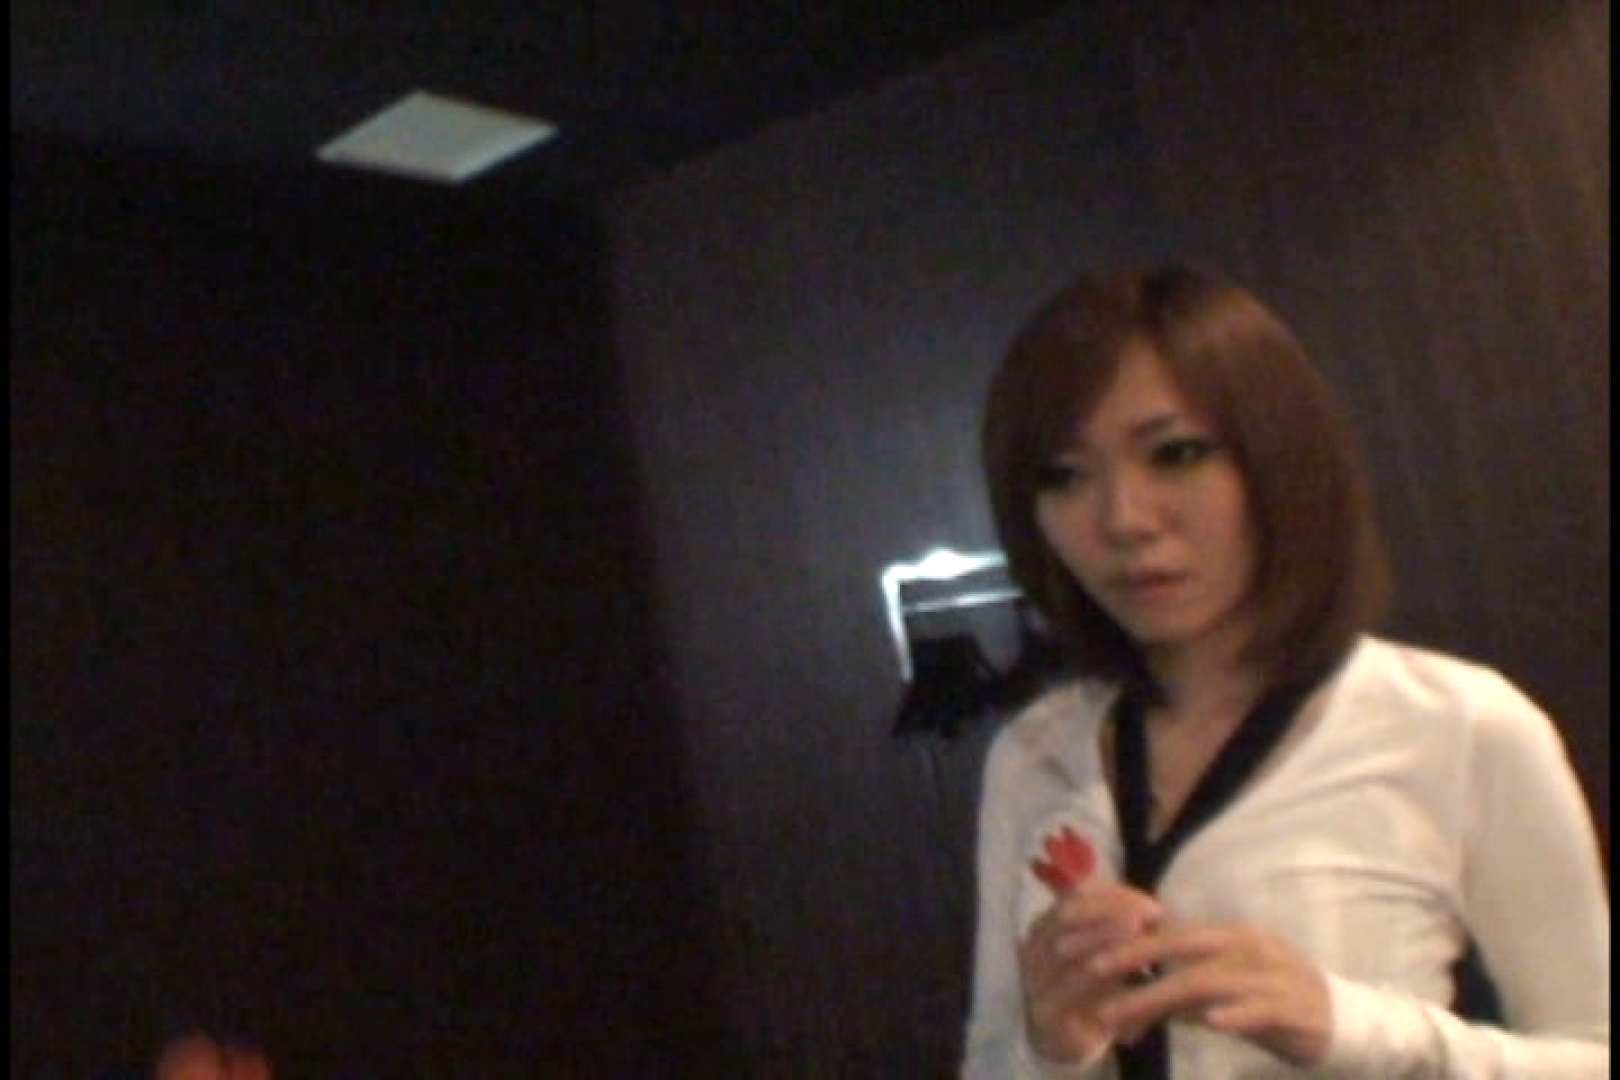 JDハンター全国ツアー vol.036 前編 女子大生のエロ動画  85PIX 38